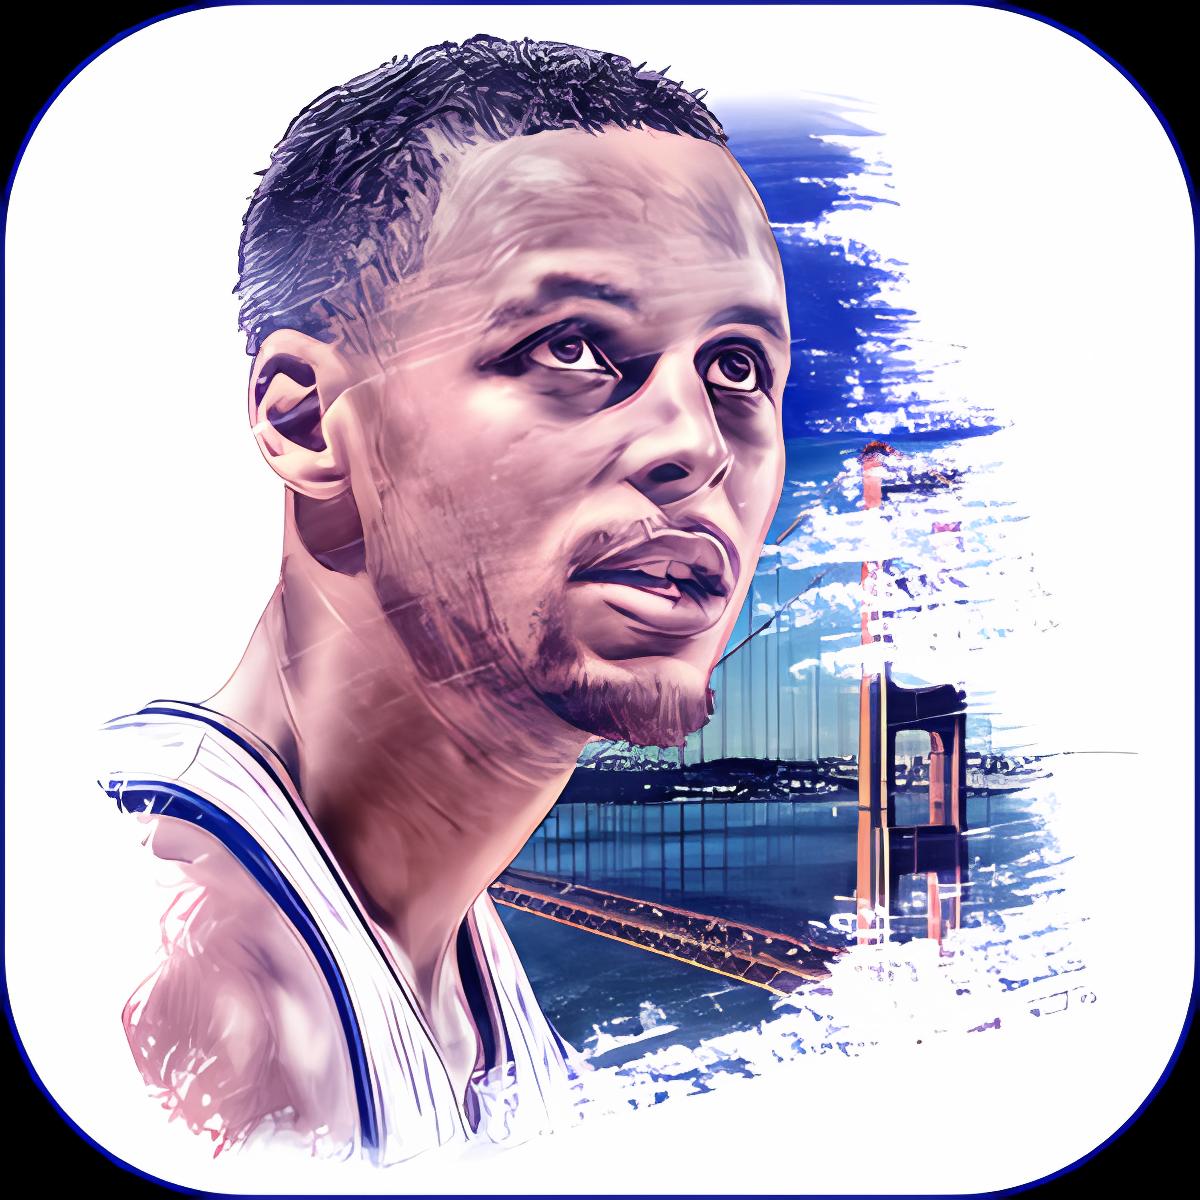 HD Stephen Curry Wallpaper 1.0.0